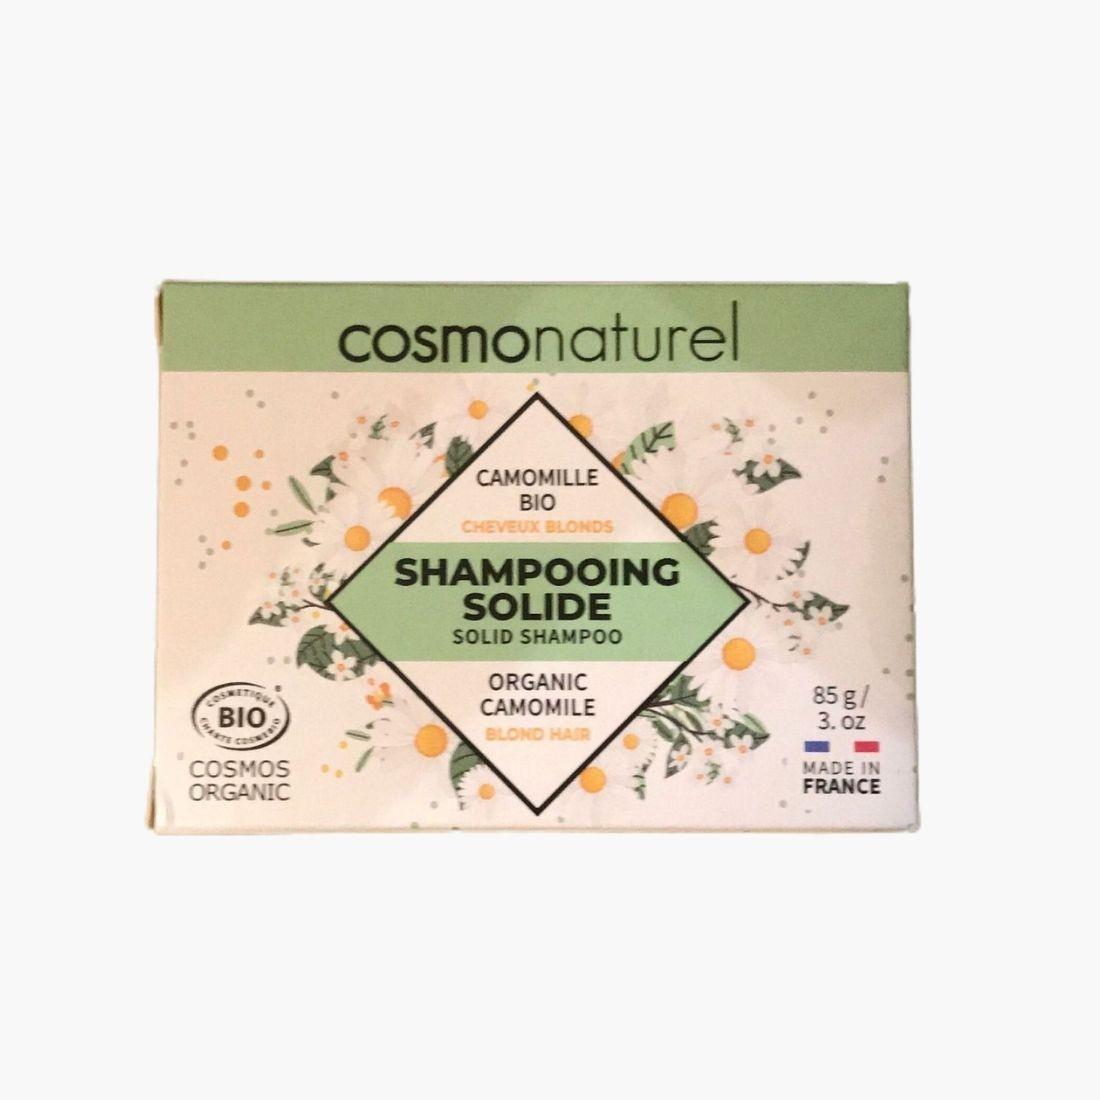 Shampoing solide BIO - Cheveux blonds Cosmo naturel